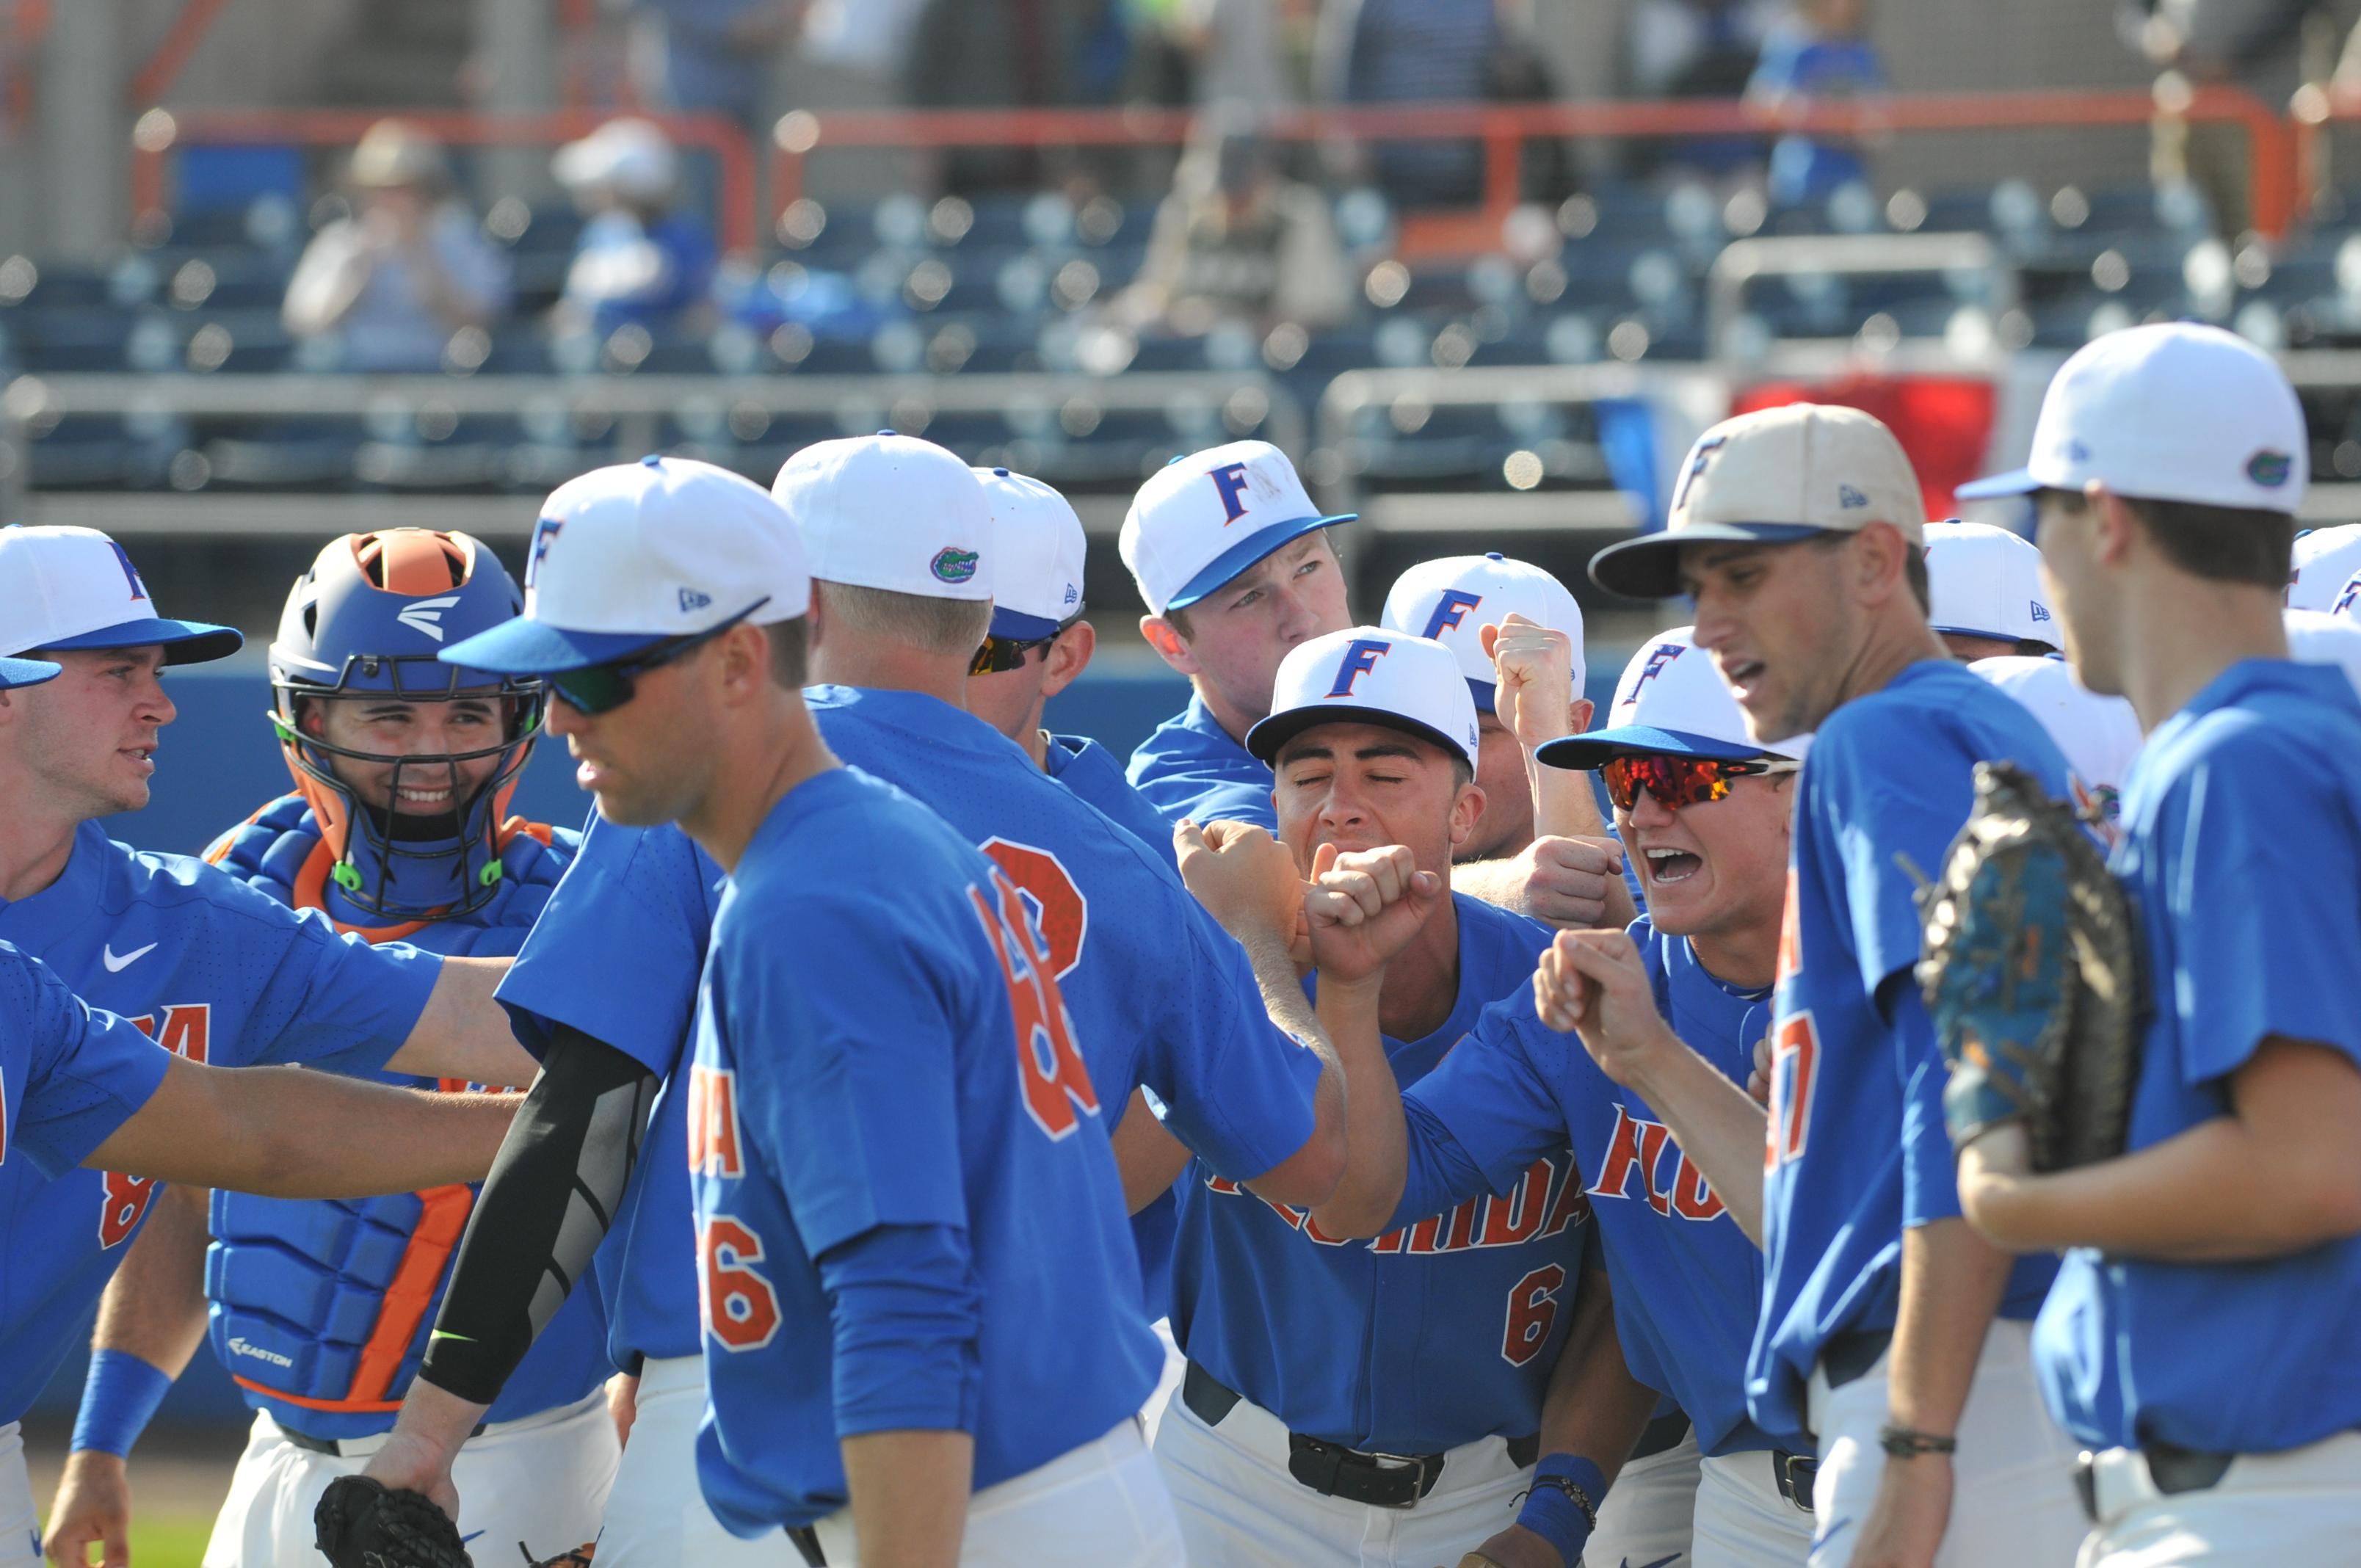 newest 5434e b10c0 Florida Gators Baseball Week in Review: Week 1 | Gator Clause